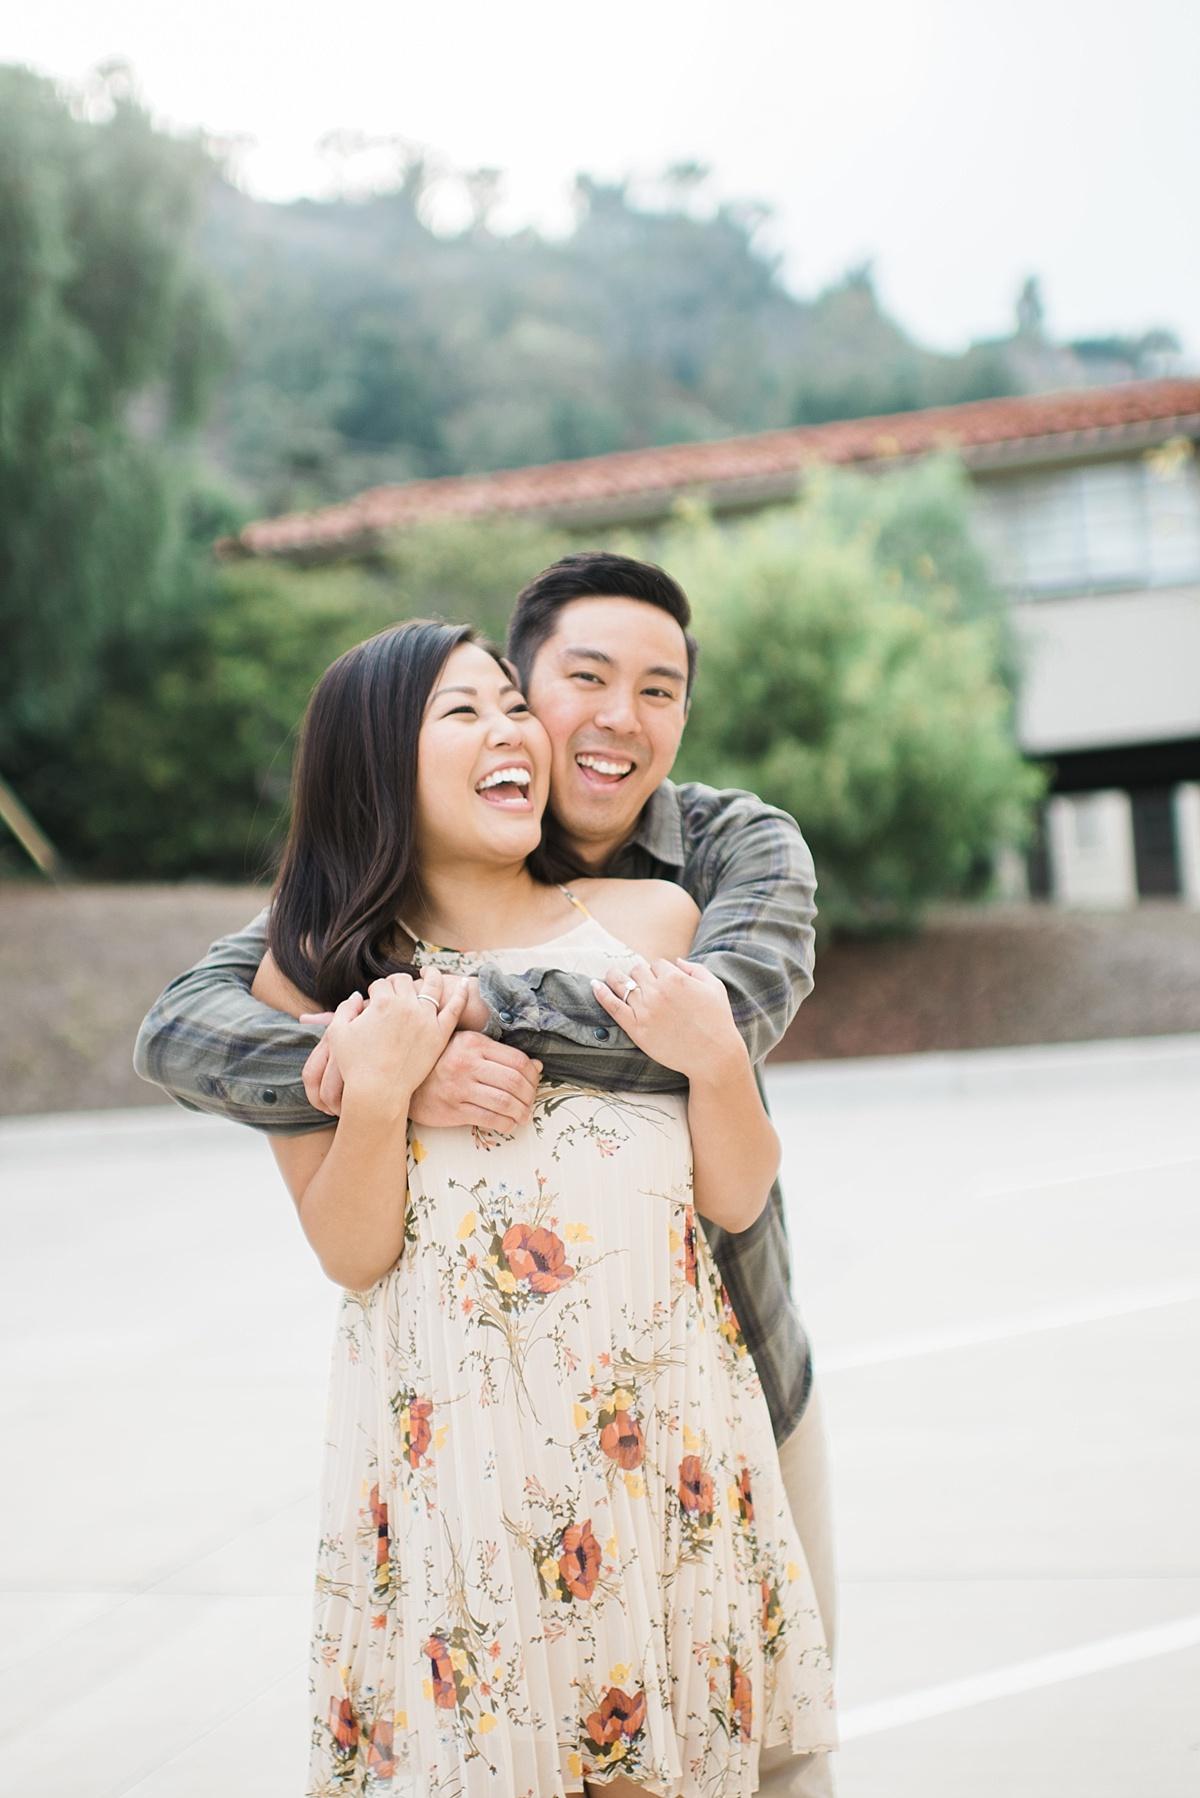 Malibu-Engagement-Photographer-Ally-Jeff-Carissa-Woo-Photography_0061.jpg